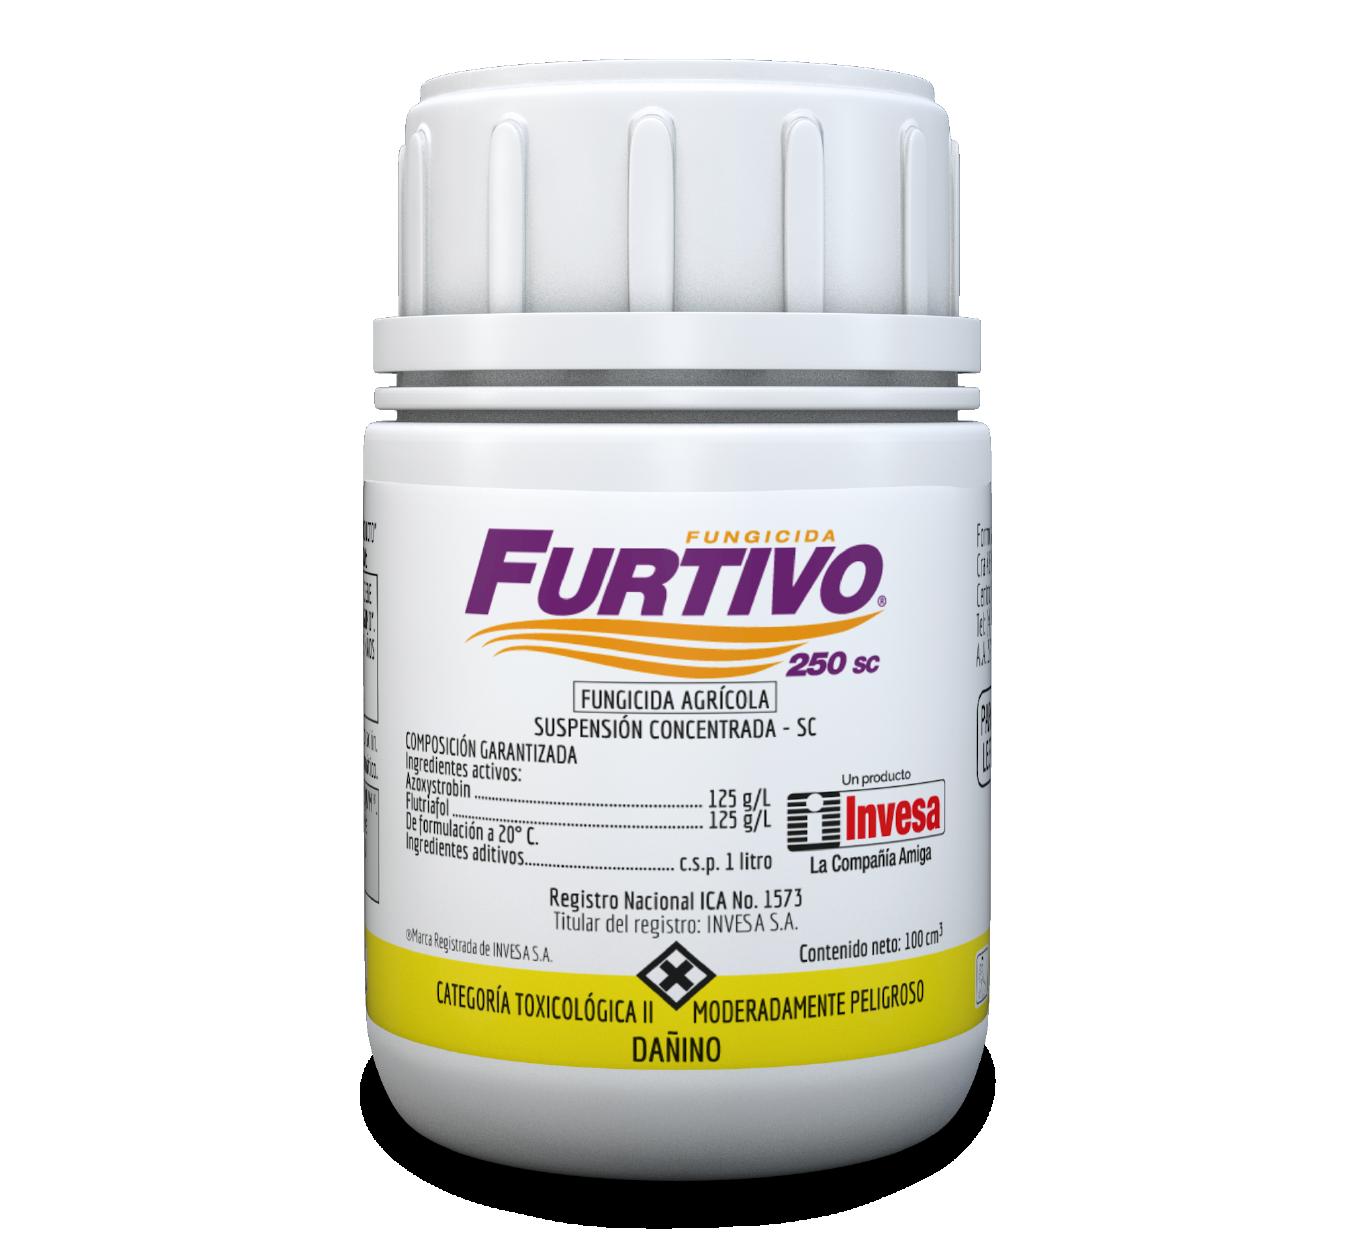 Fungicida furtivo 250 sc invesa 100 cc